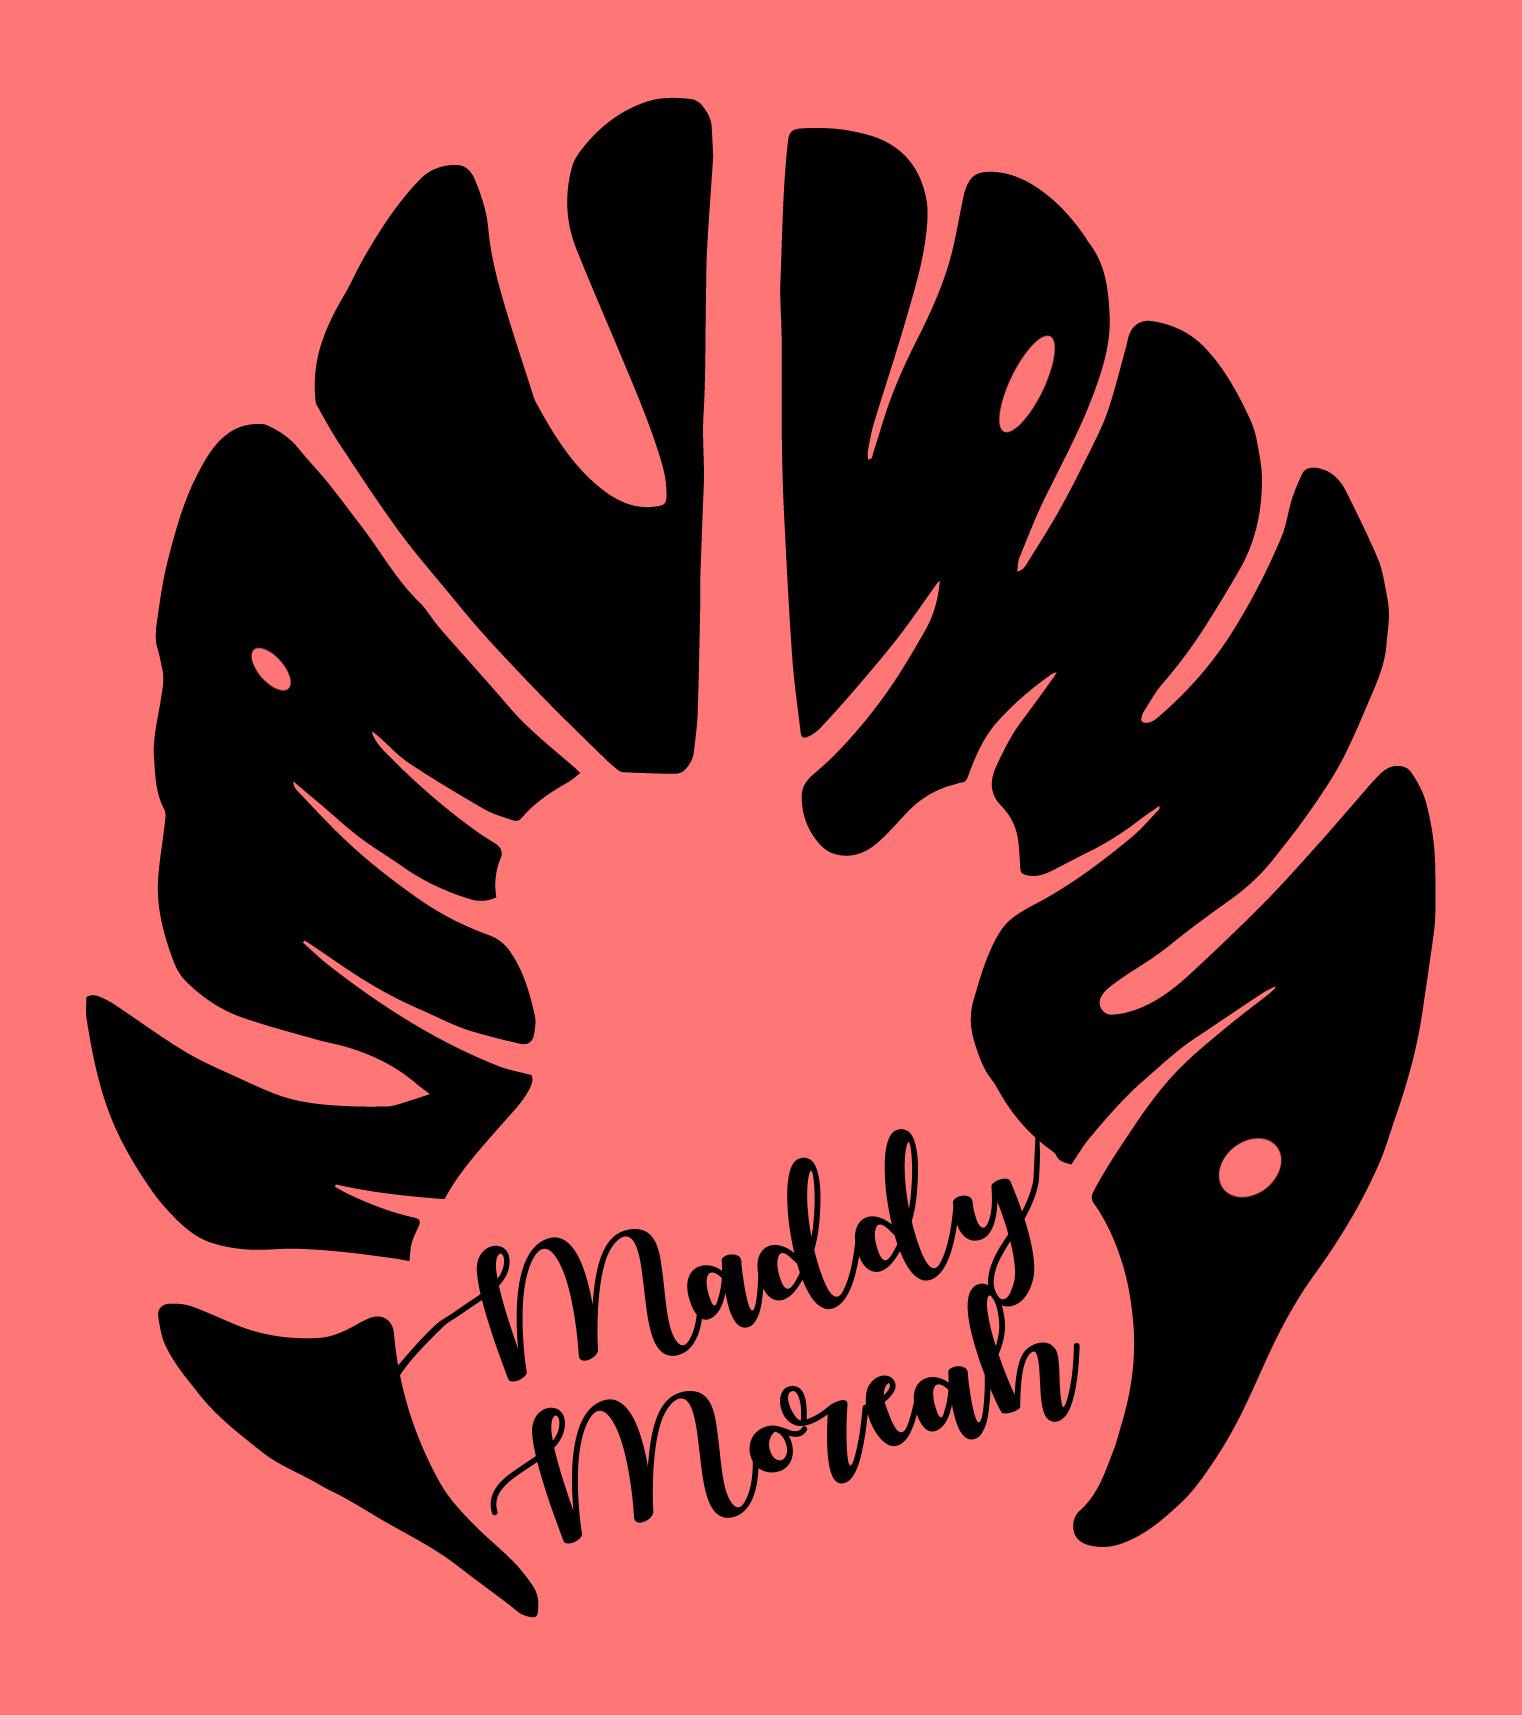 Maddy Moreah